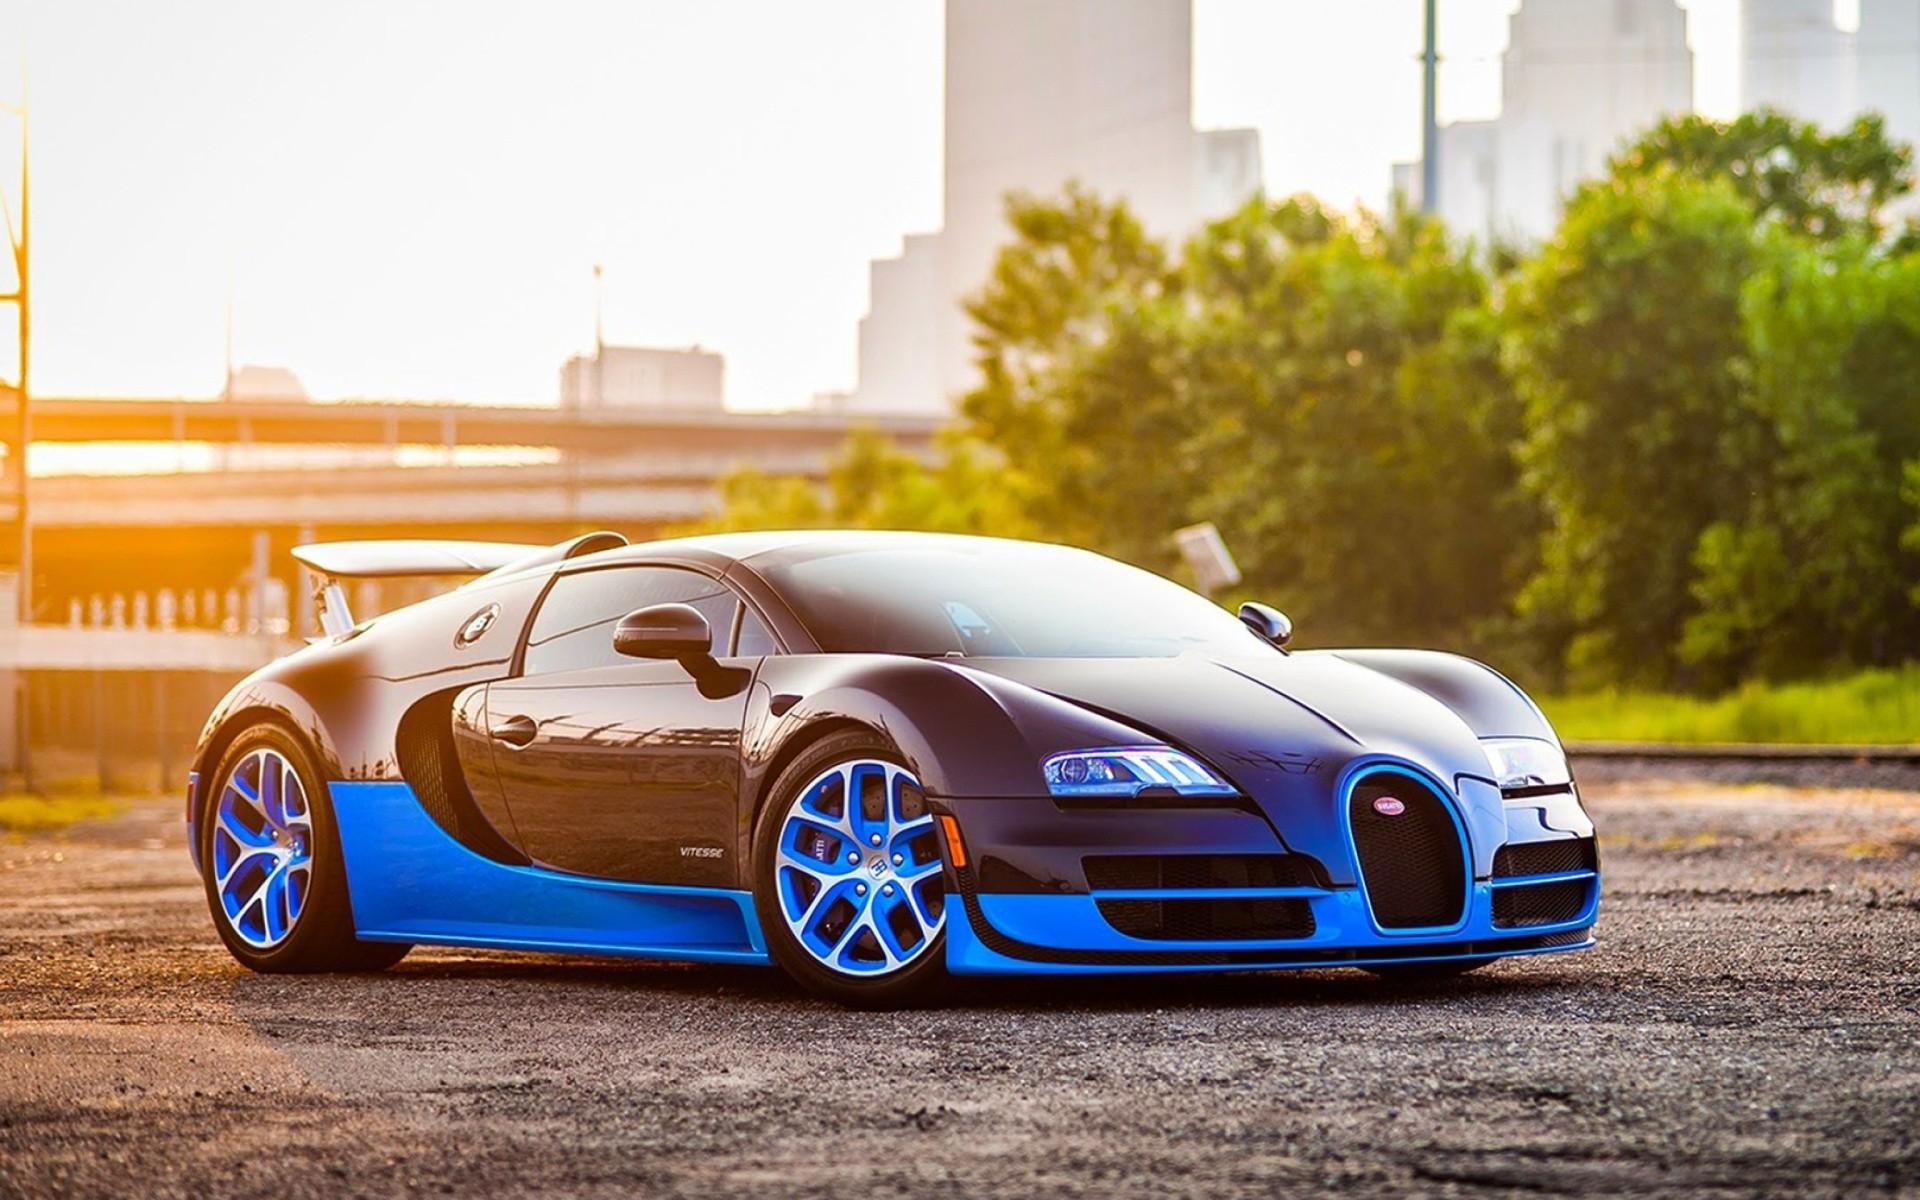 Bugatti Veyron Super Sport Gold Wallpaper: Bugatti Veyron Super Sport Wallpaper ·① WallpaperTag